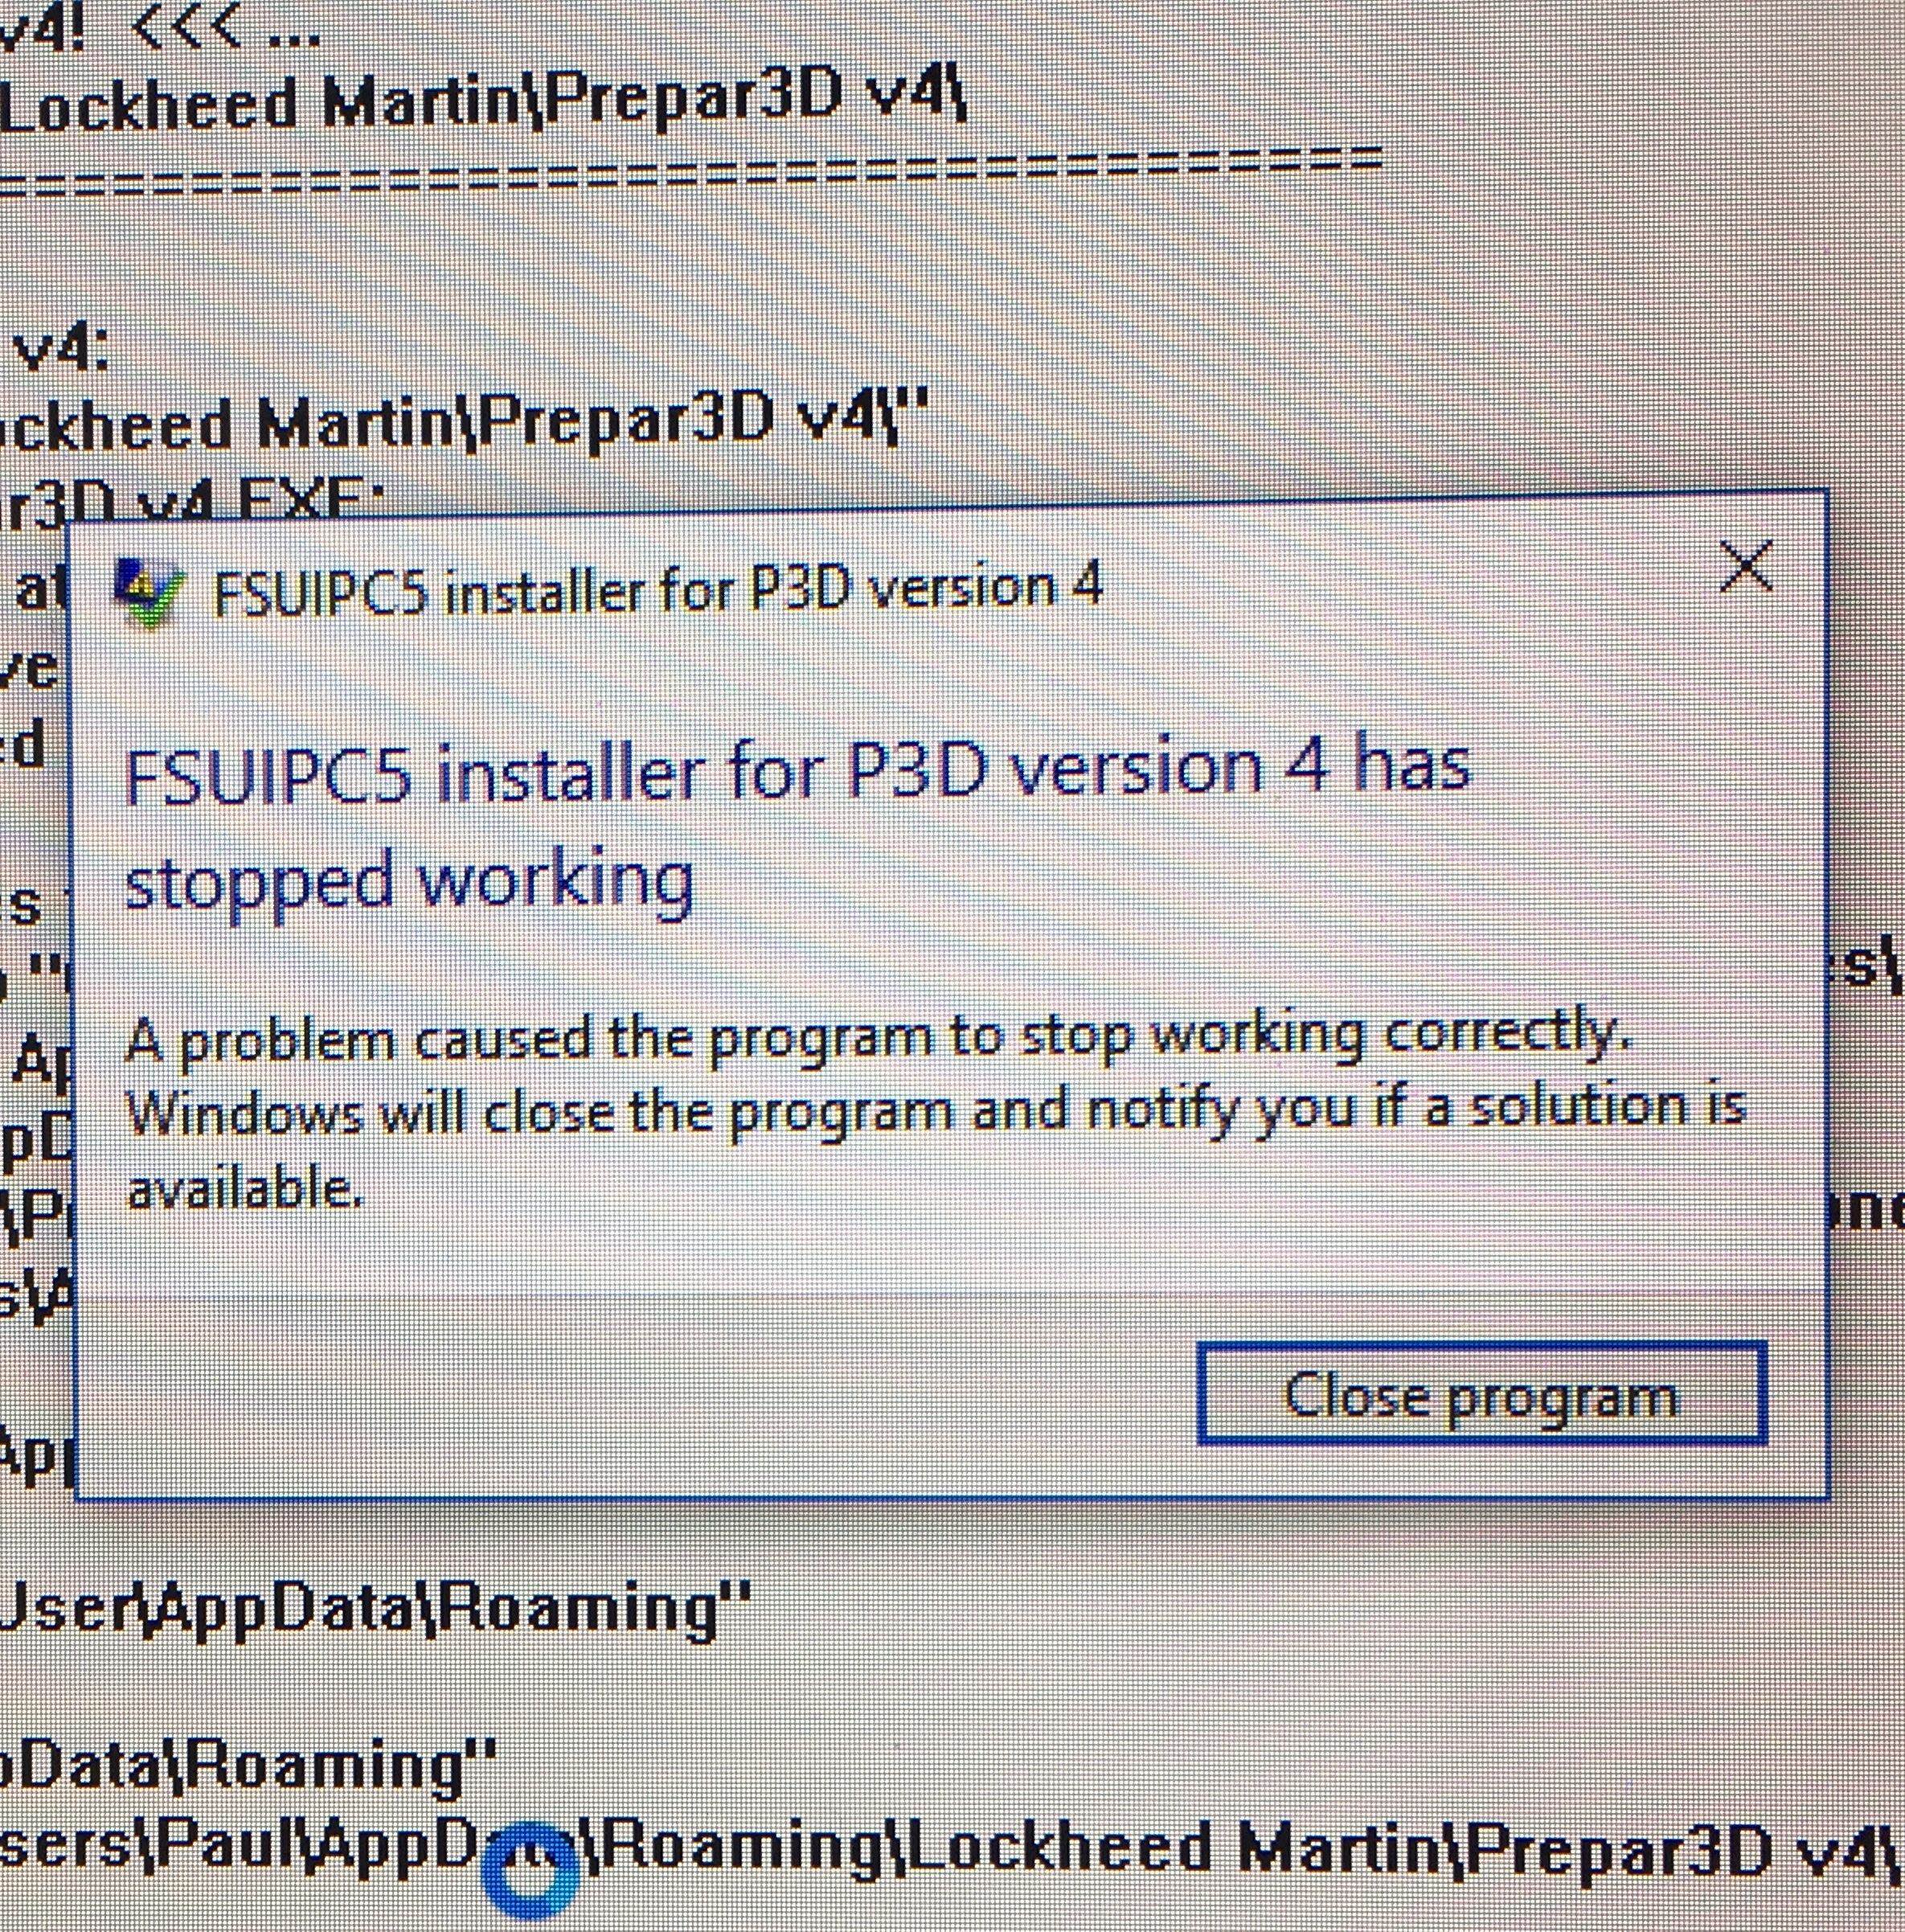 FSUIPC is not showing up in Prepar3d 4 1 - FSUIPC Support